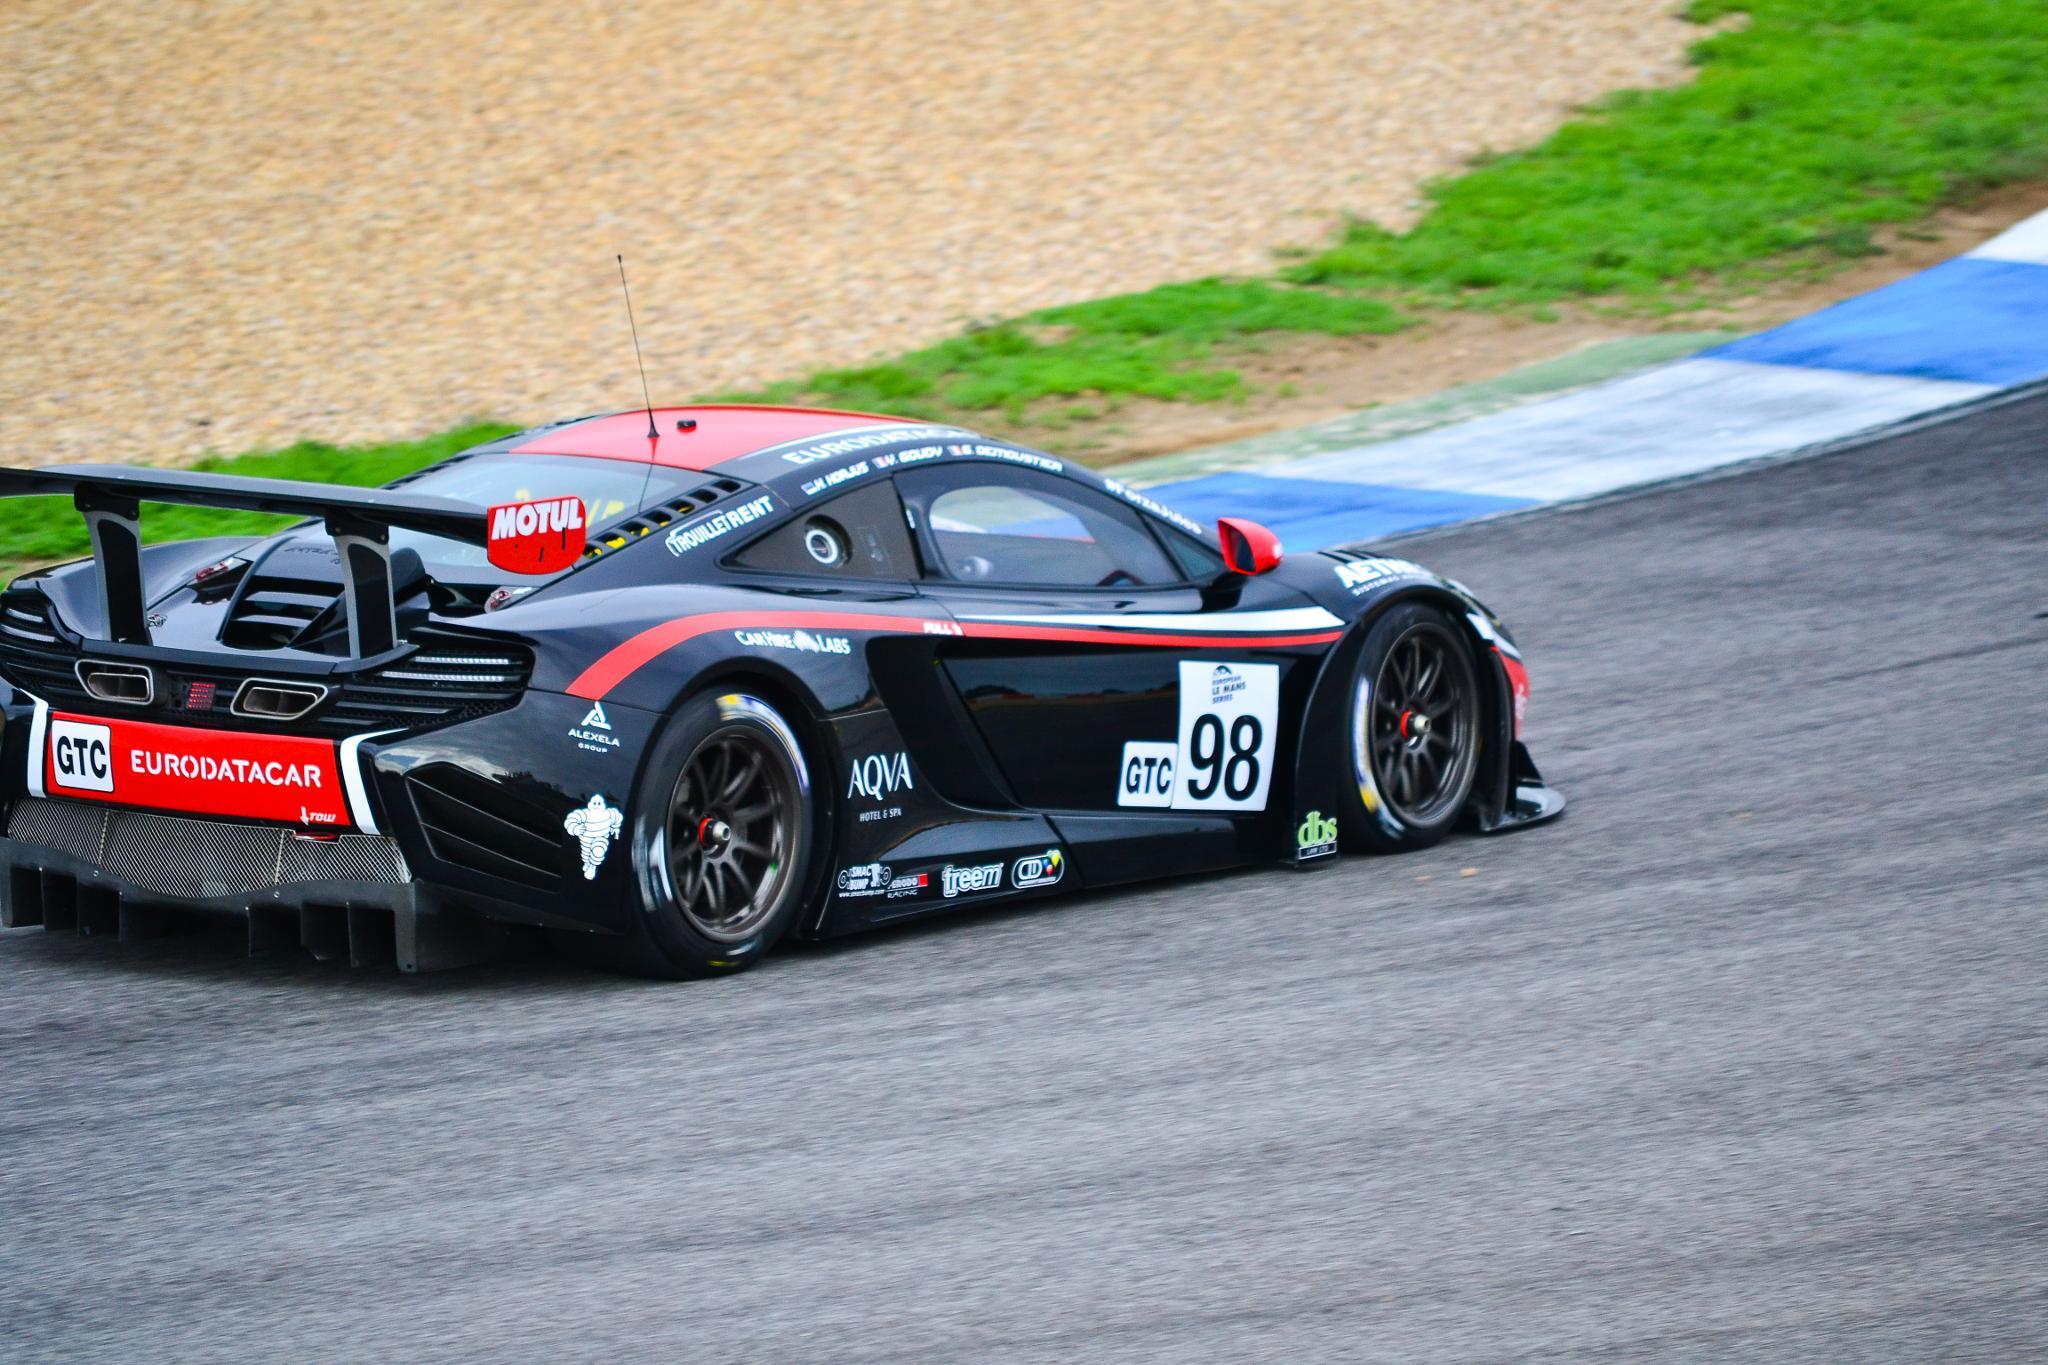 Mclaren GT racing car by José Pedro Borges